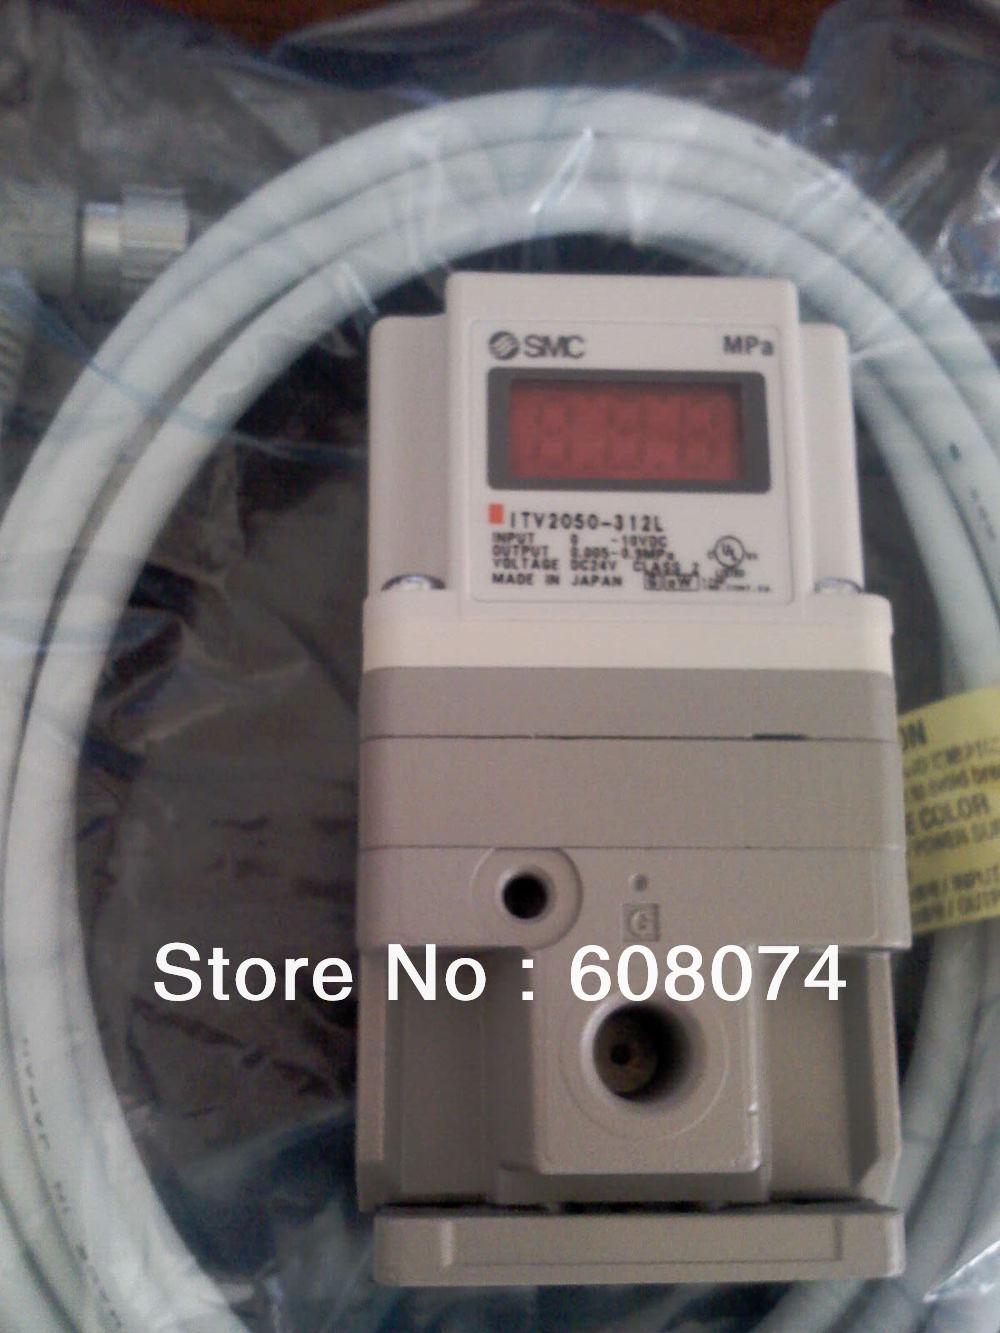 NEW ITV2030-212L ELECTRO/PNEUMATIC REGULATOR, 24VDC 1/4 PORT NEW itv2030 312l electro pneumatic regulator 24vdc 1 4 port 0 10v input